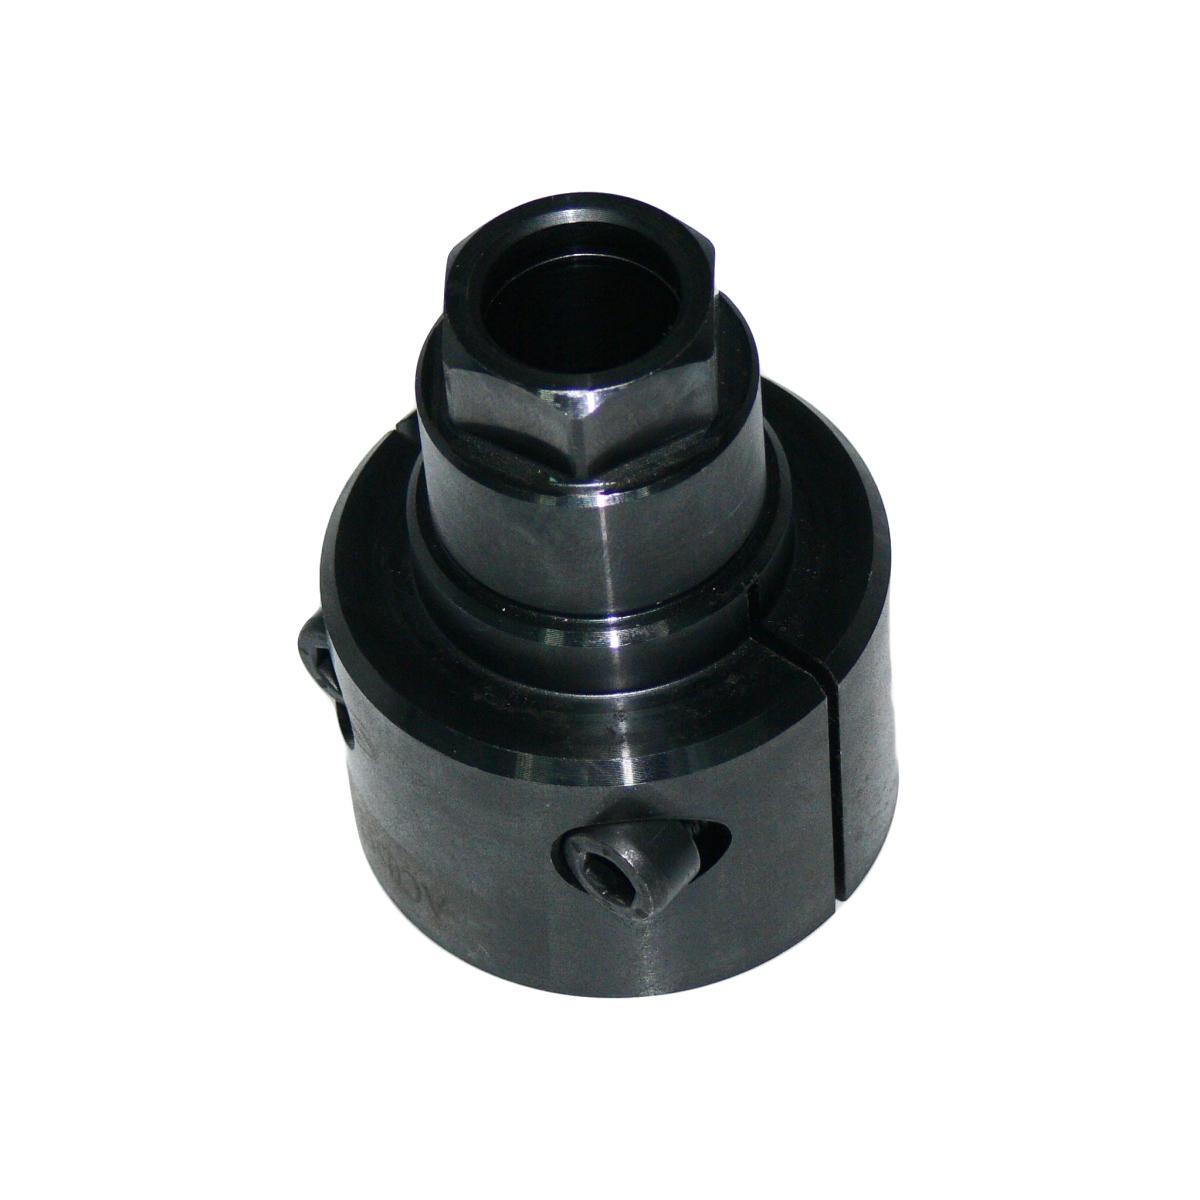 Ключ для разборки насос-форсунки DELPHI Car-Tool CT-0552S